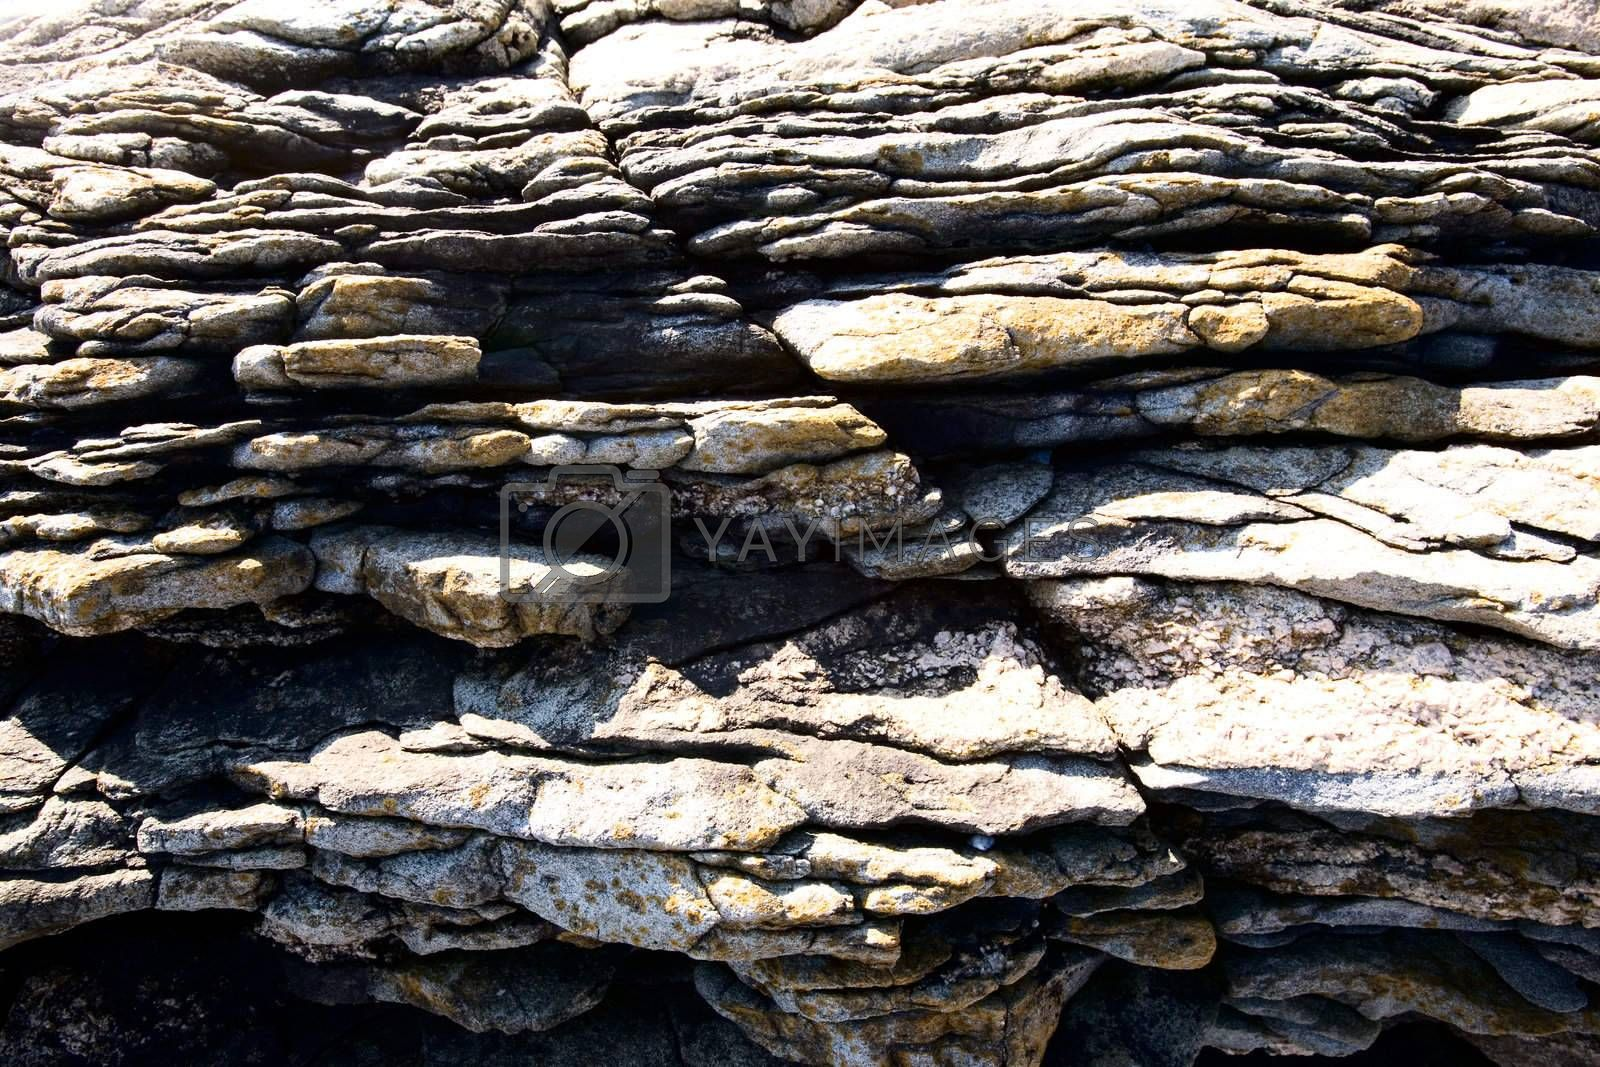 Background image of jagged rocks